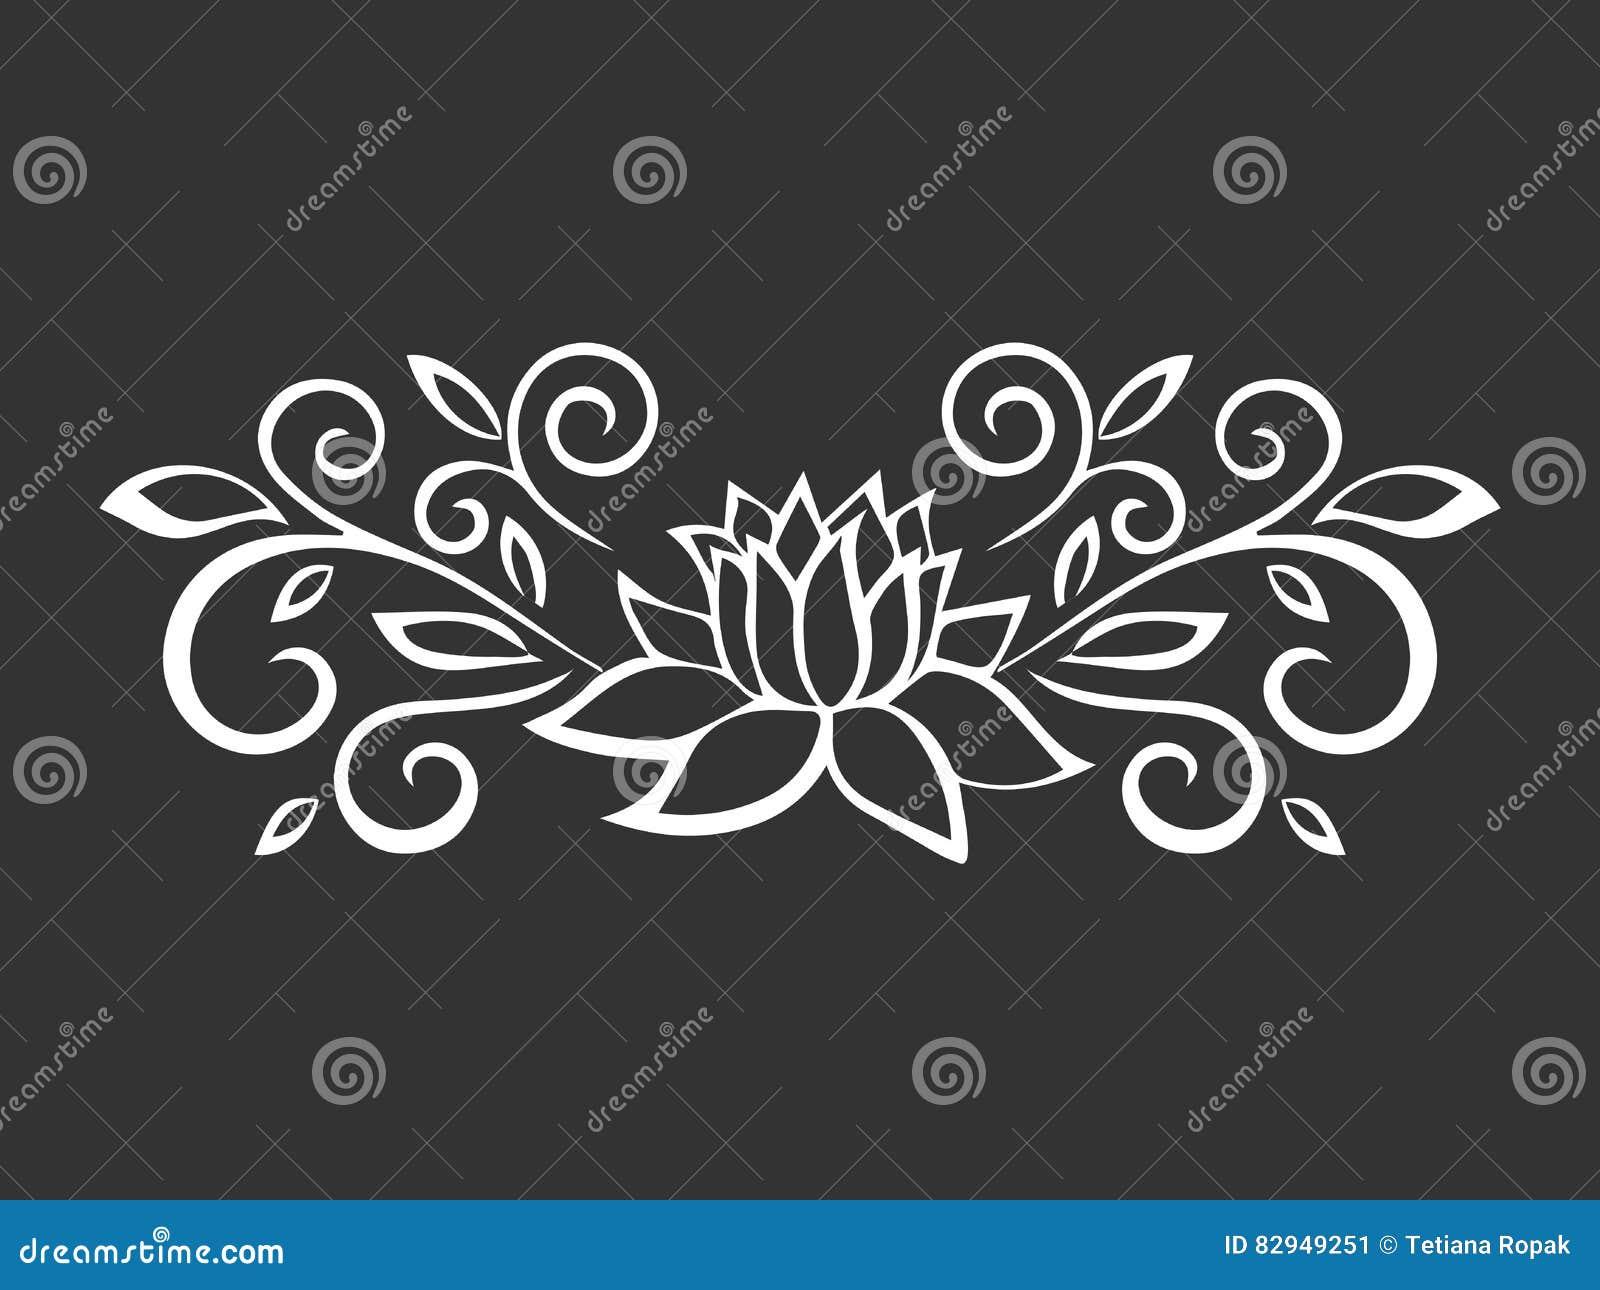 Lotus Sketch Plant Motif Flower Design Elements Vector